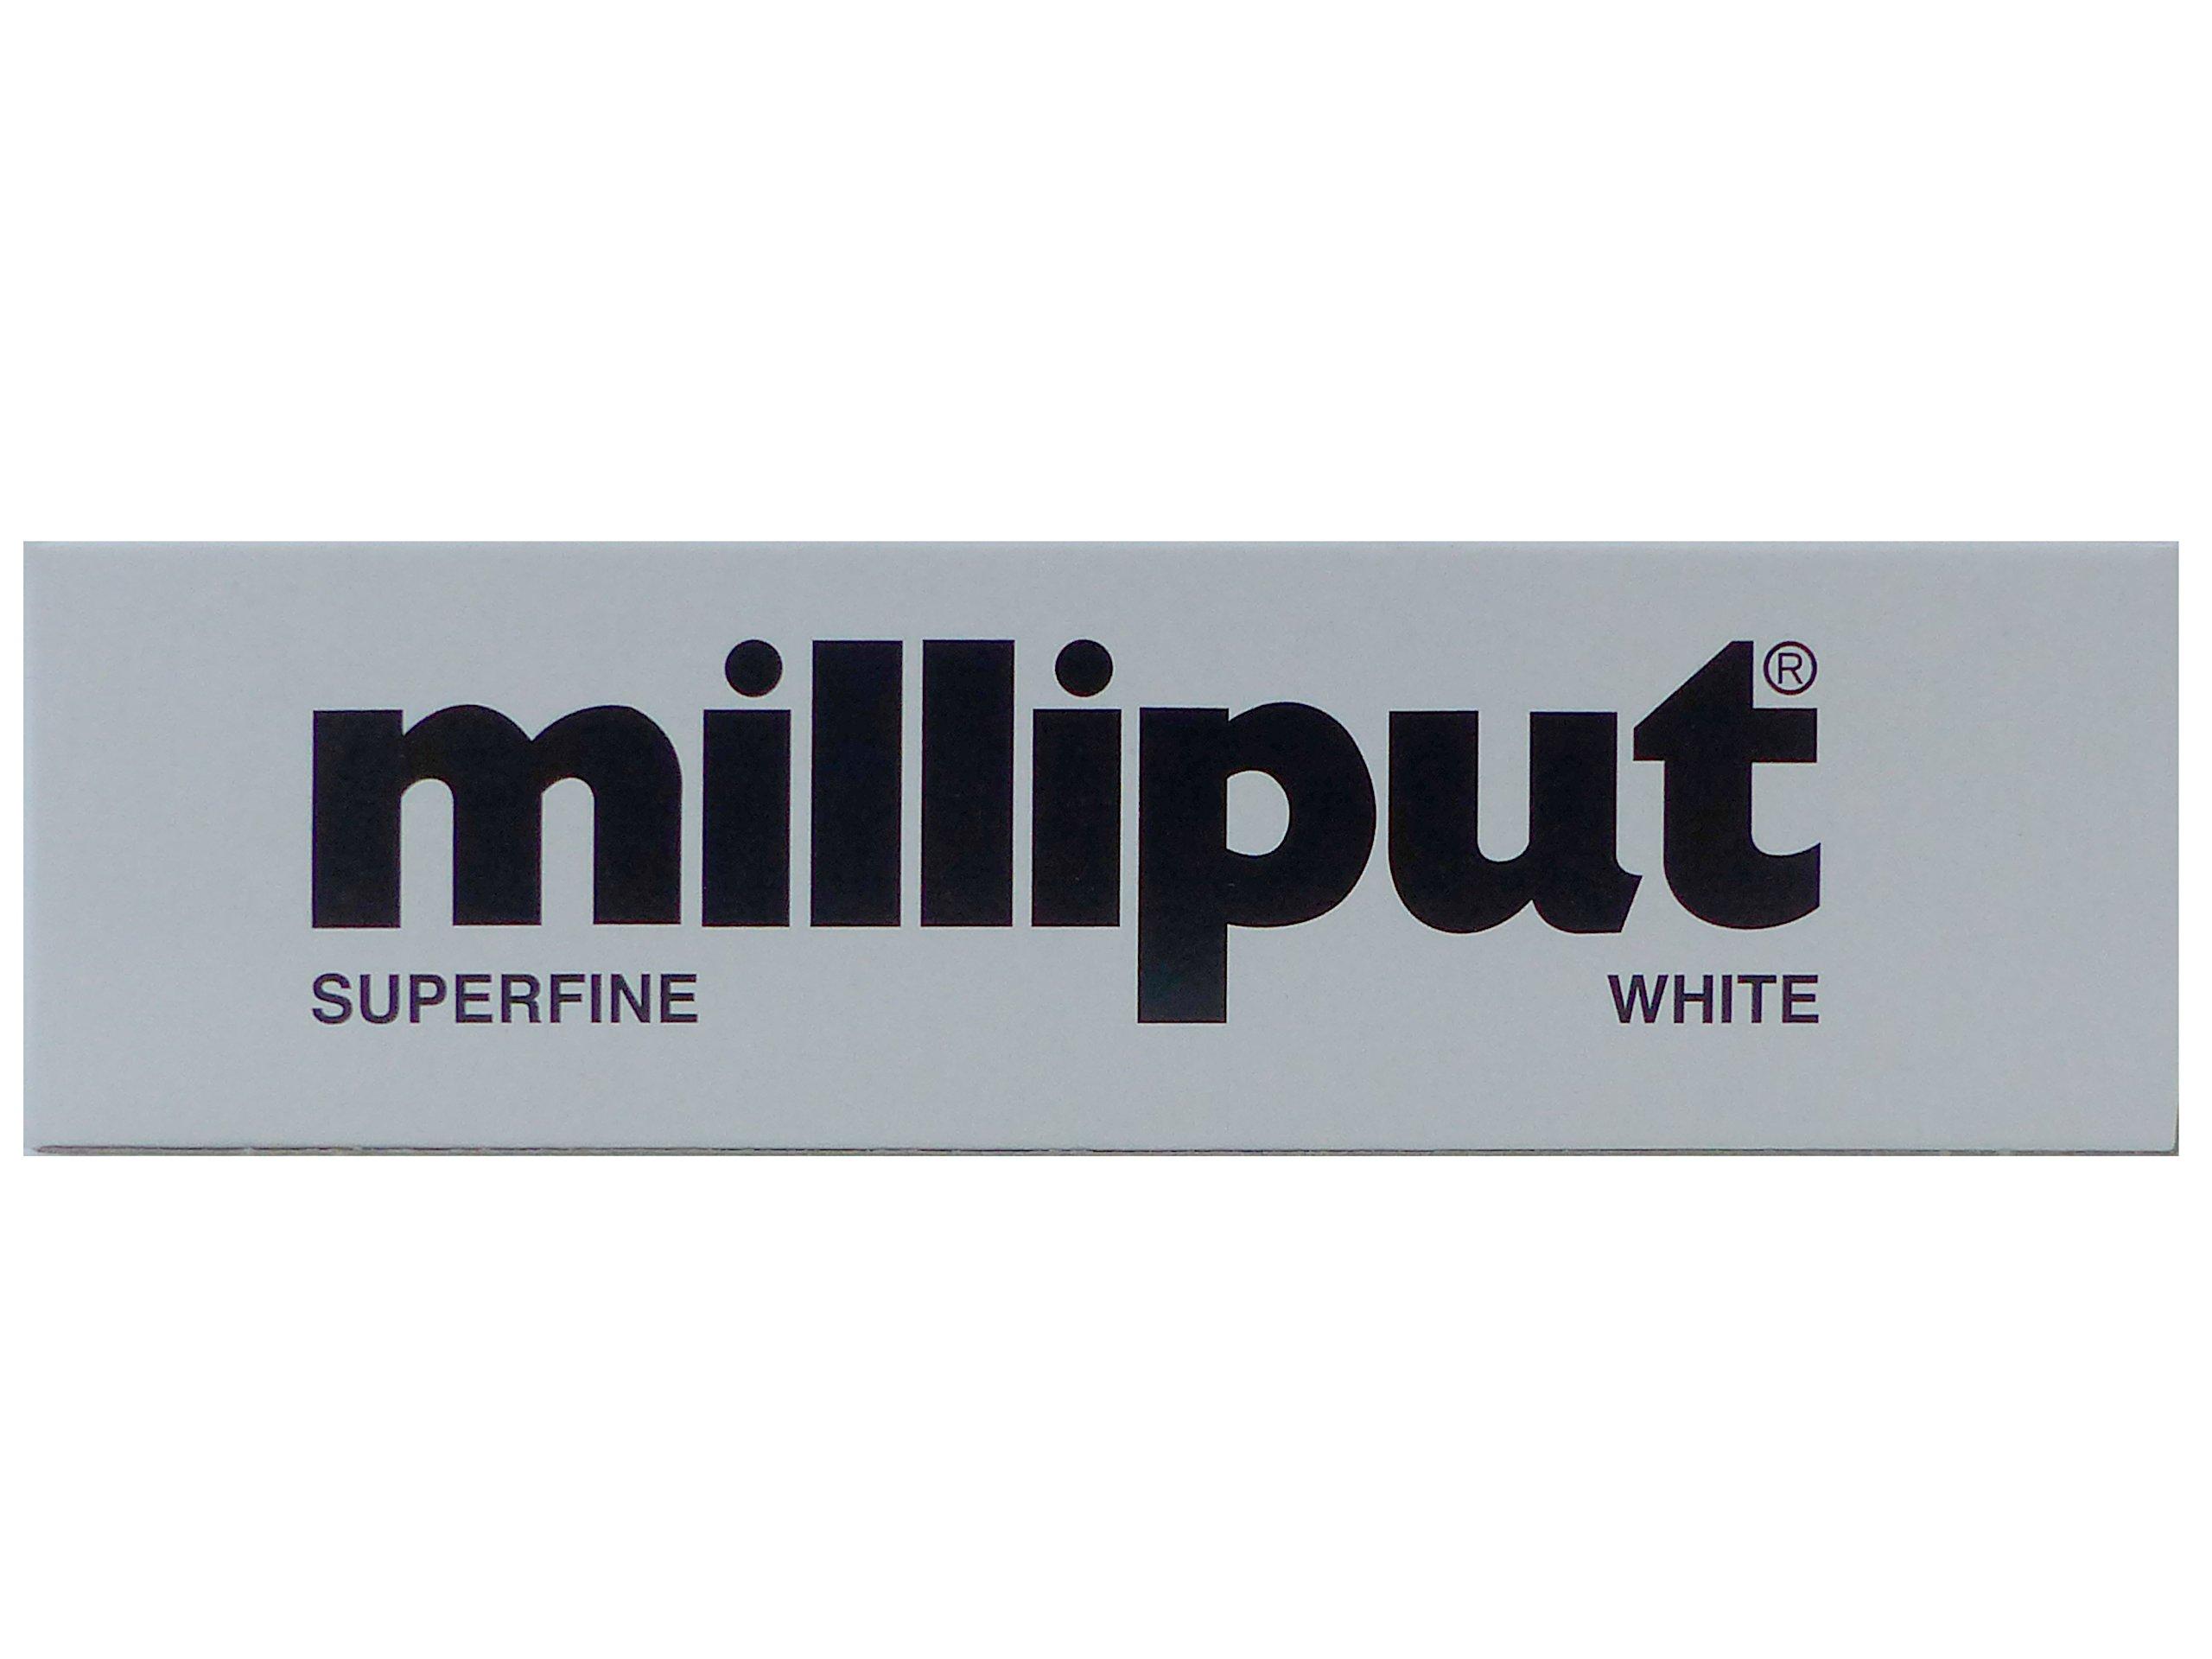 Milliput Superfine 2-Part Self Hardening Putty, White product image